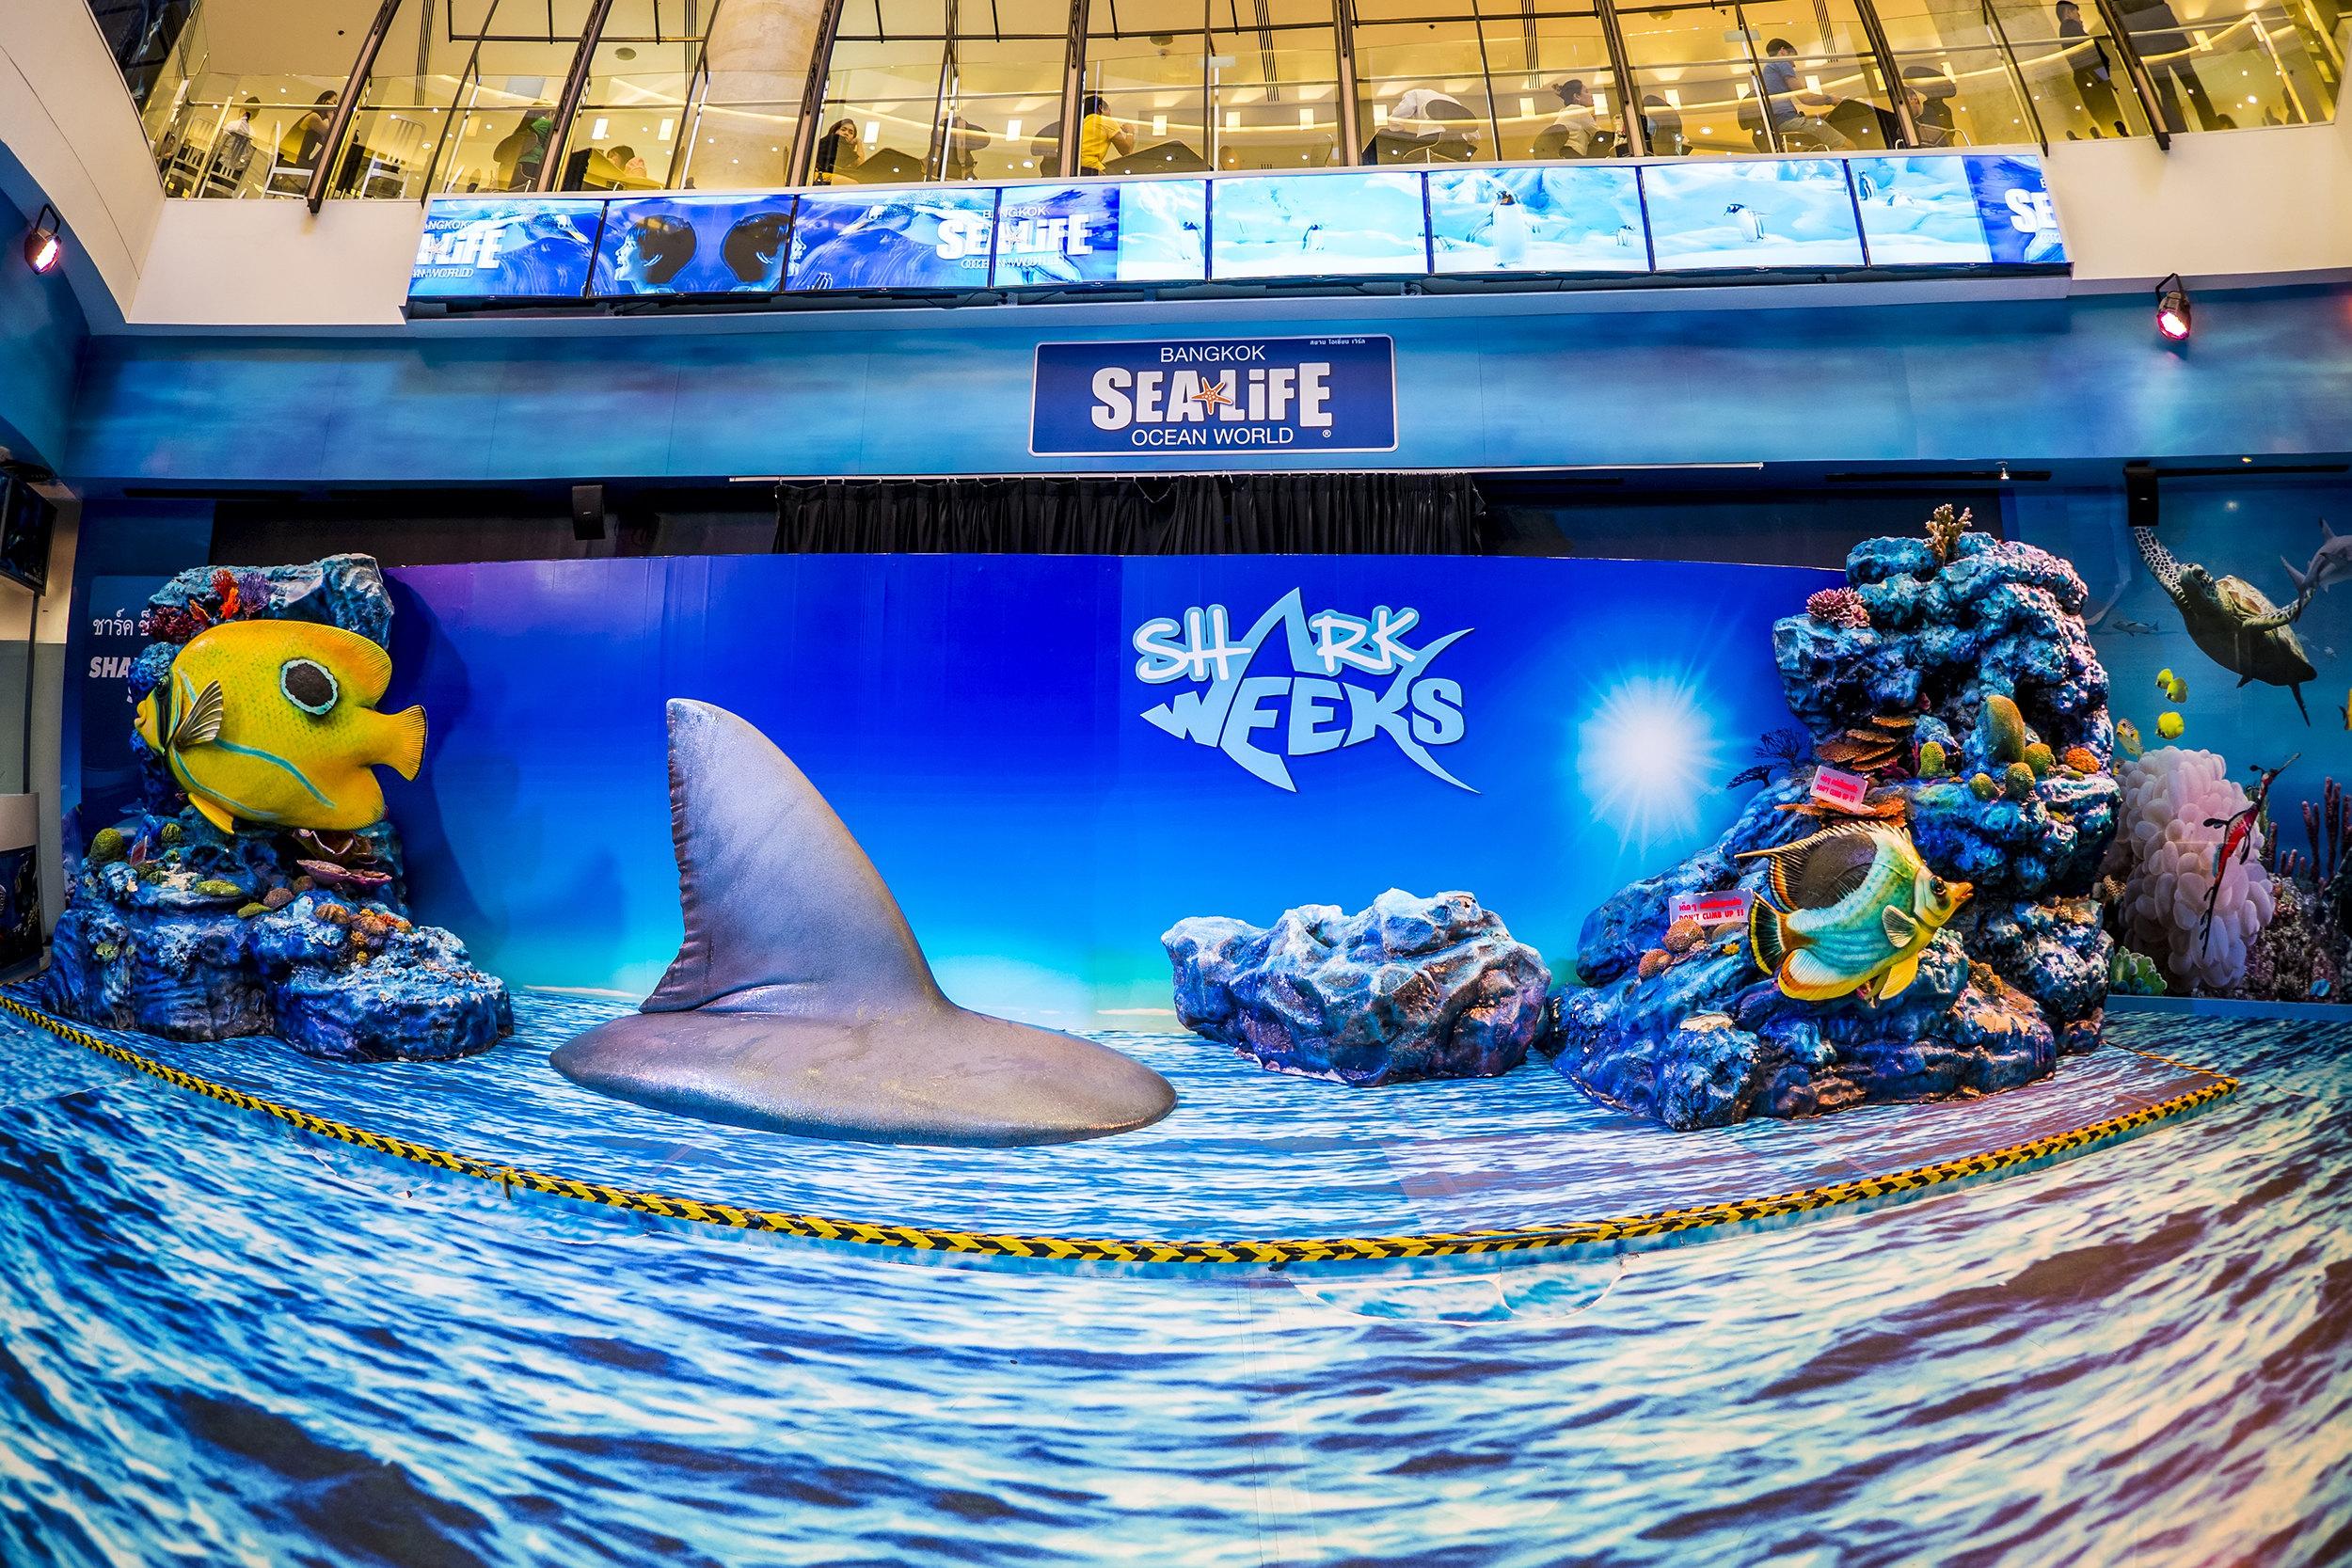 曼谷暹羅海洋世界  Sea Life Bangkok Ocean World   -0